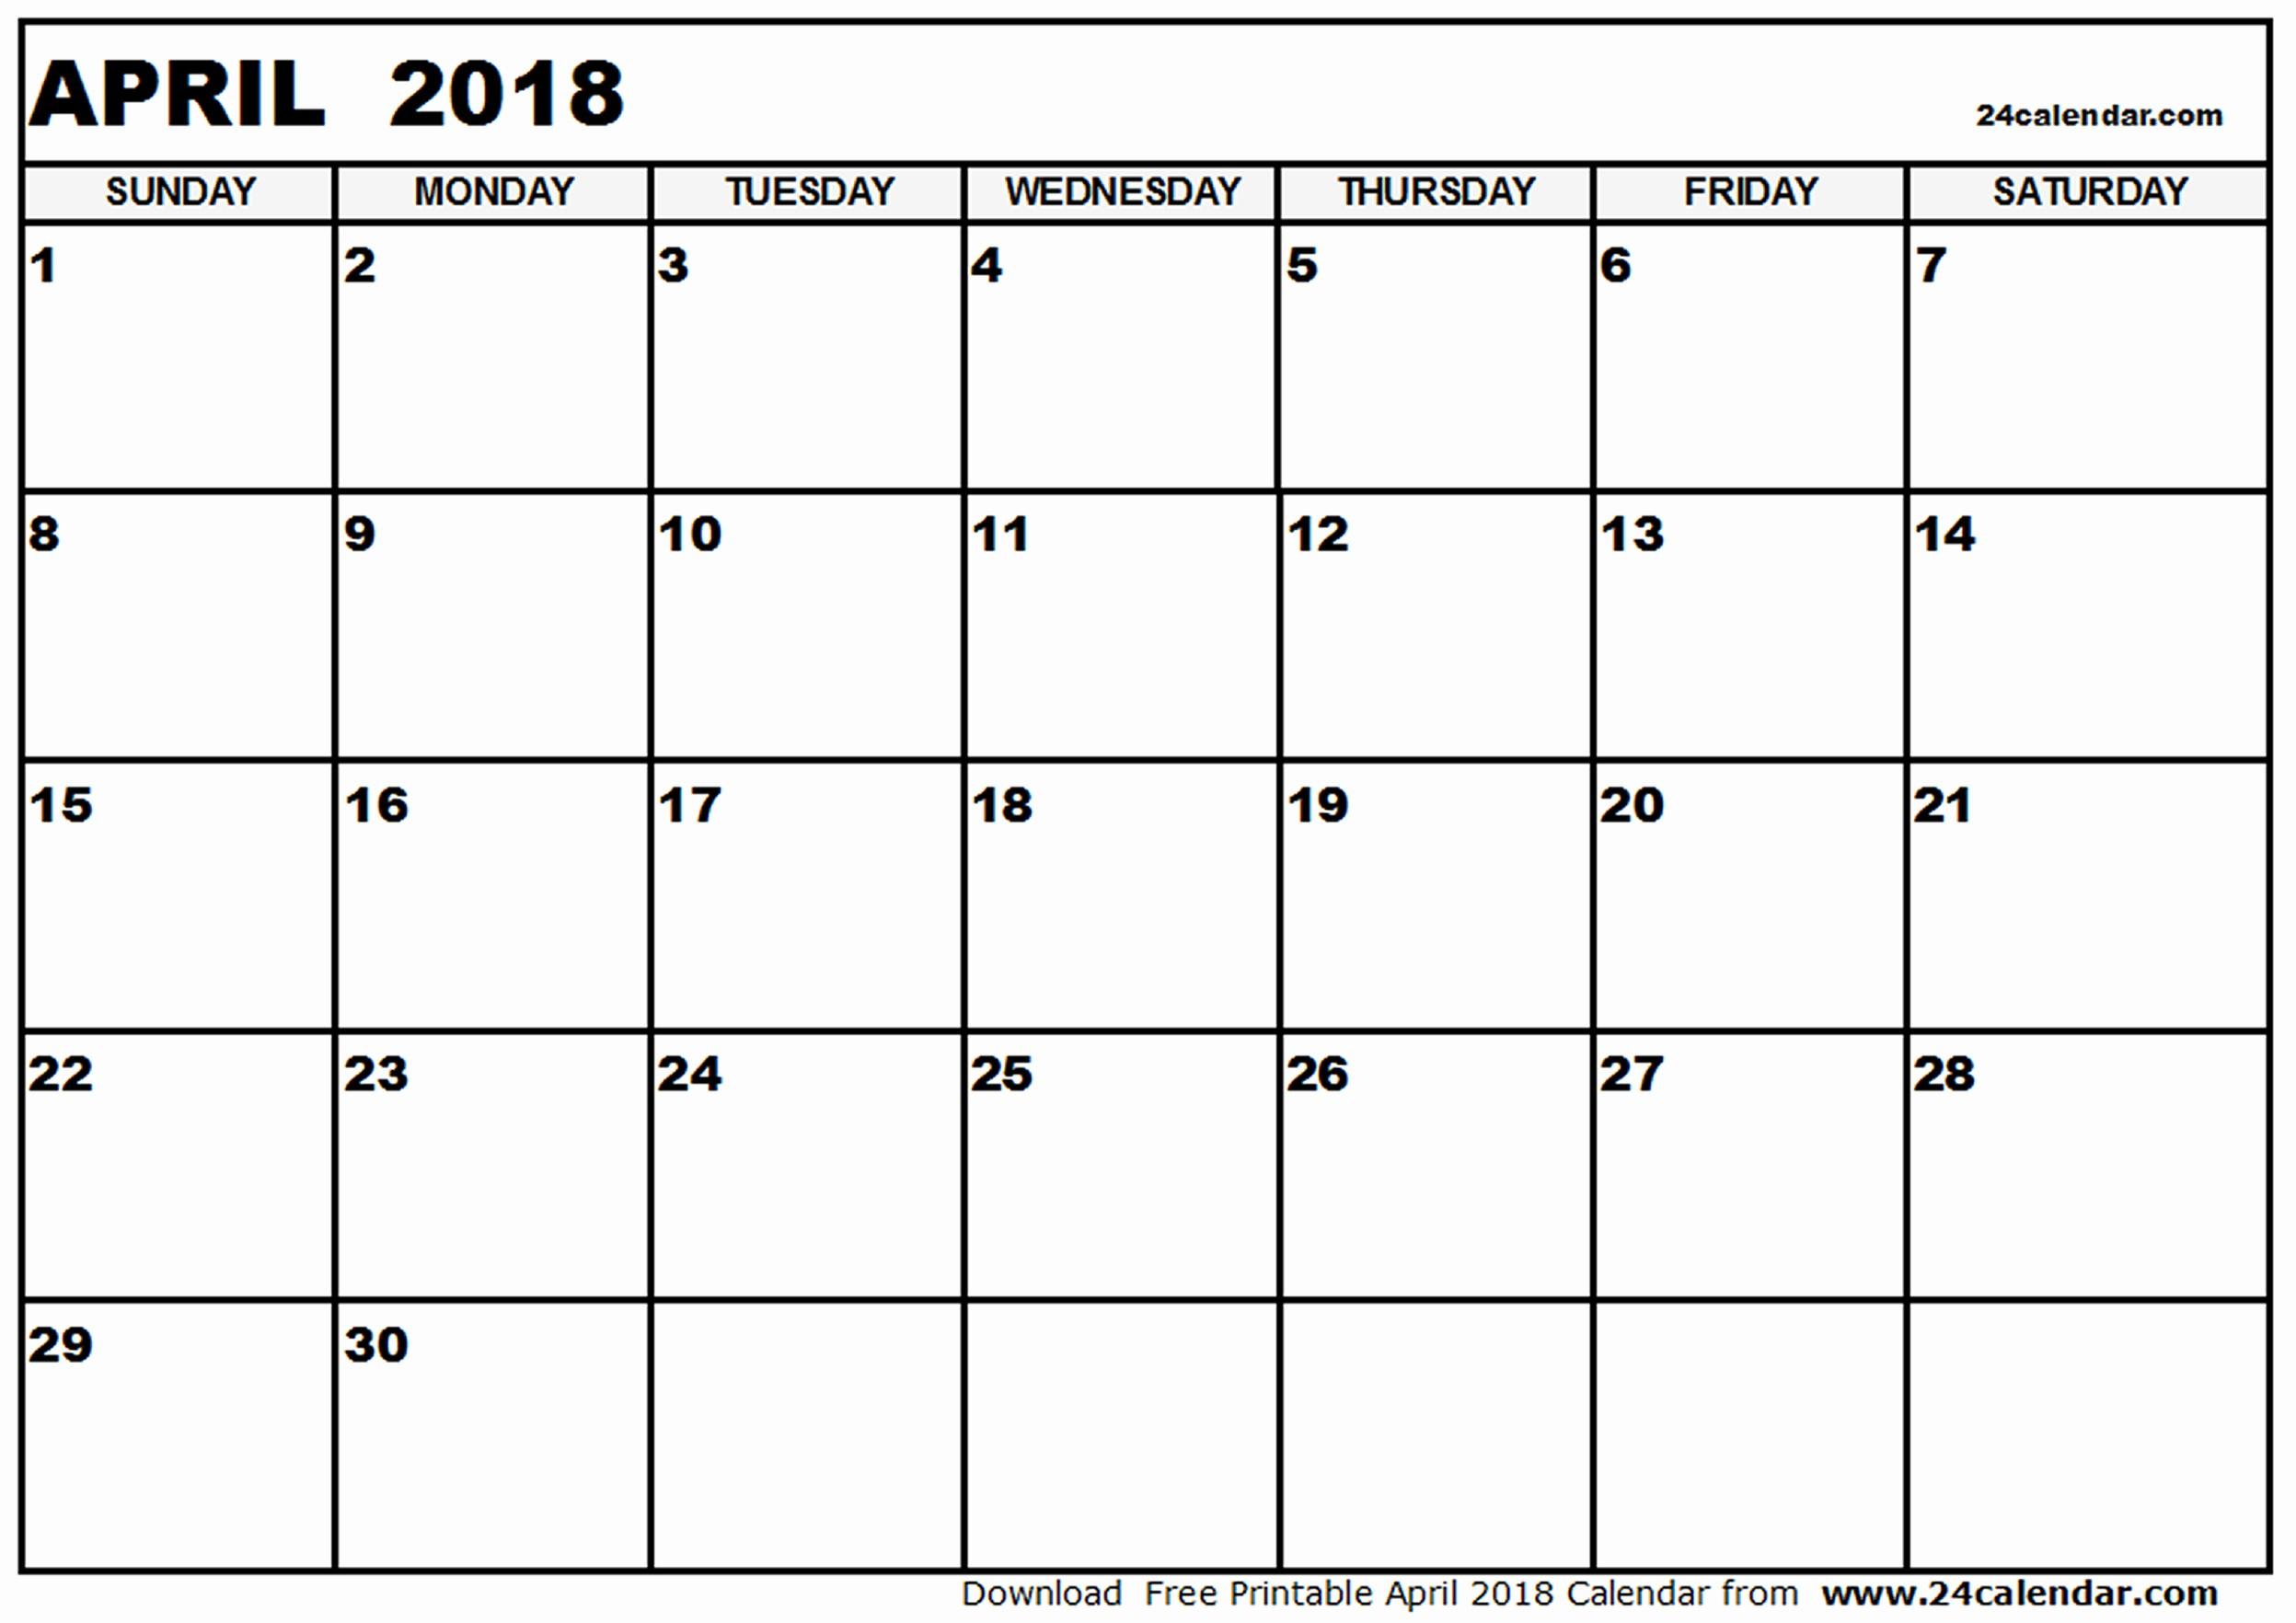 Blank April 2018 Calendar Template Inspirational Blank 2018 Calendar